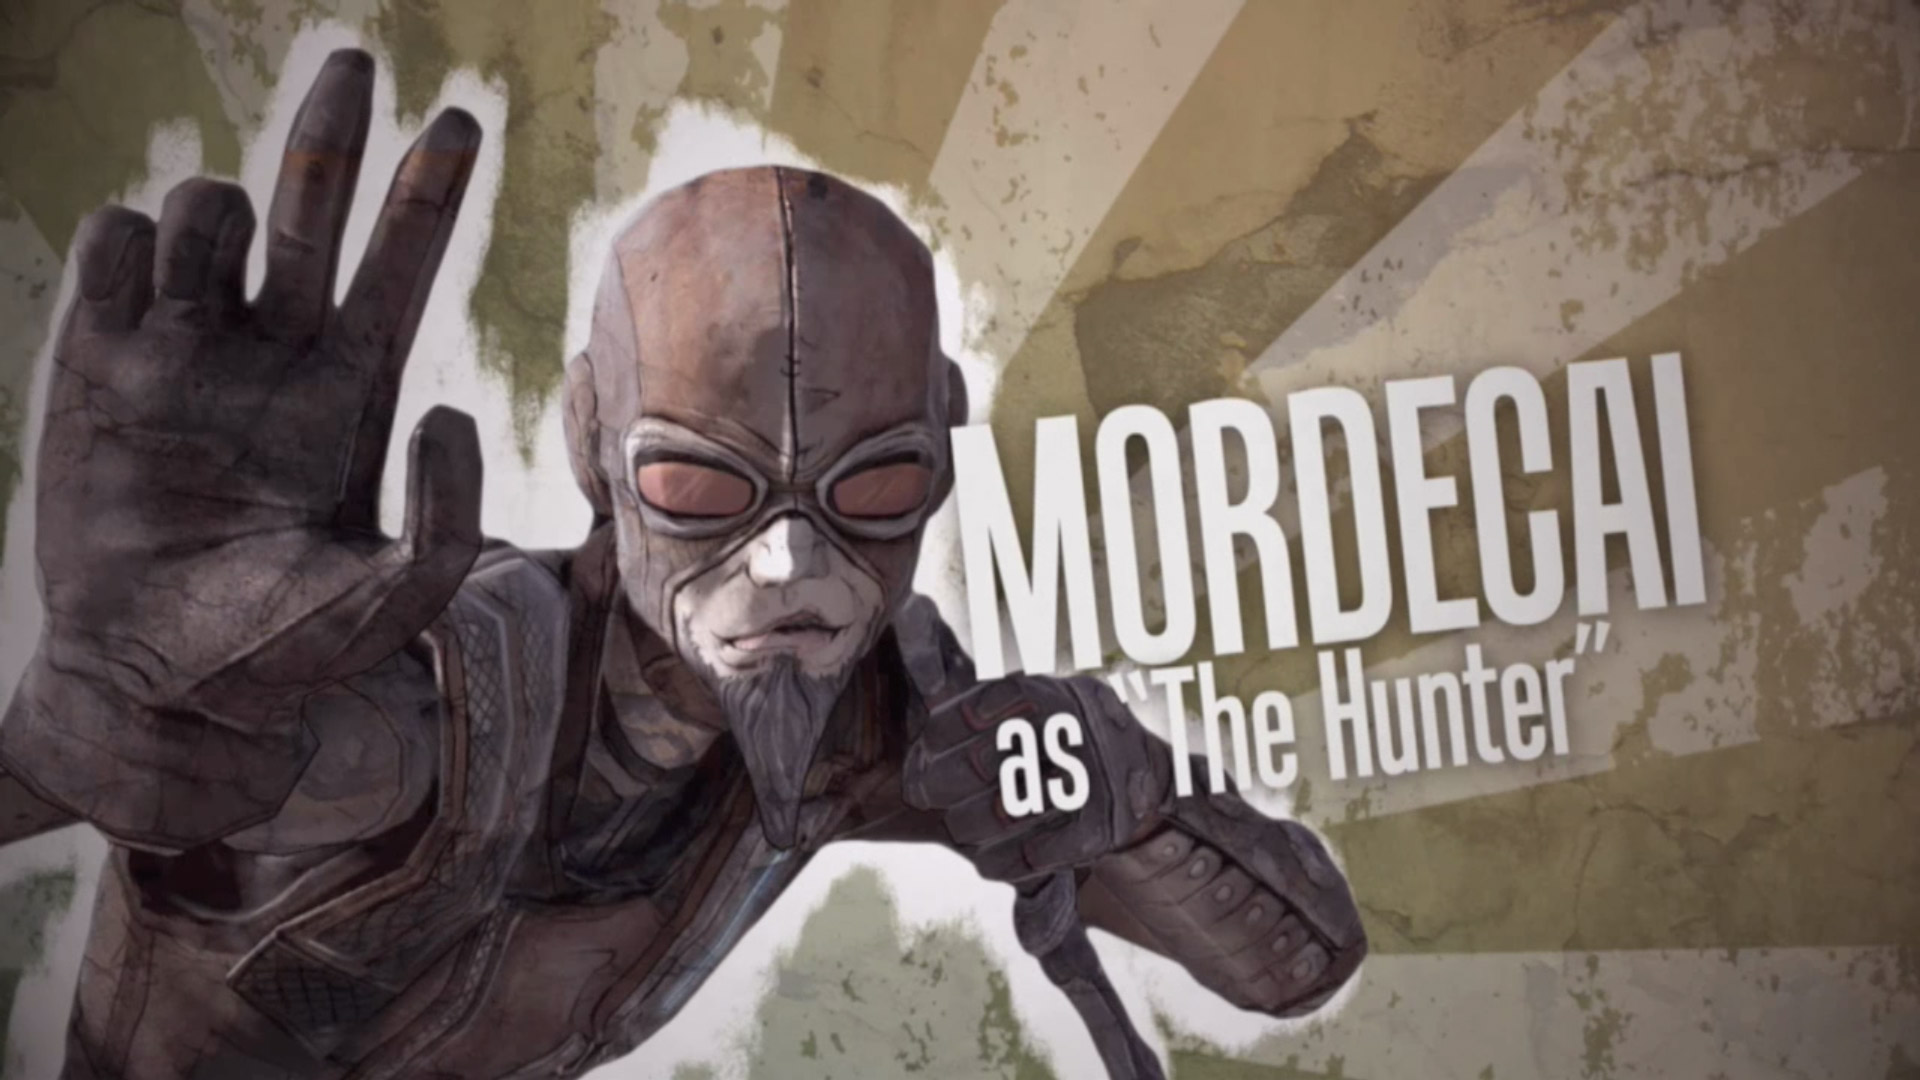 Mordecaï (Borderlands)